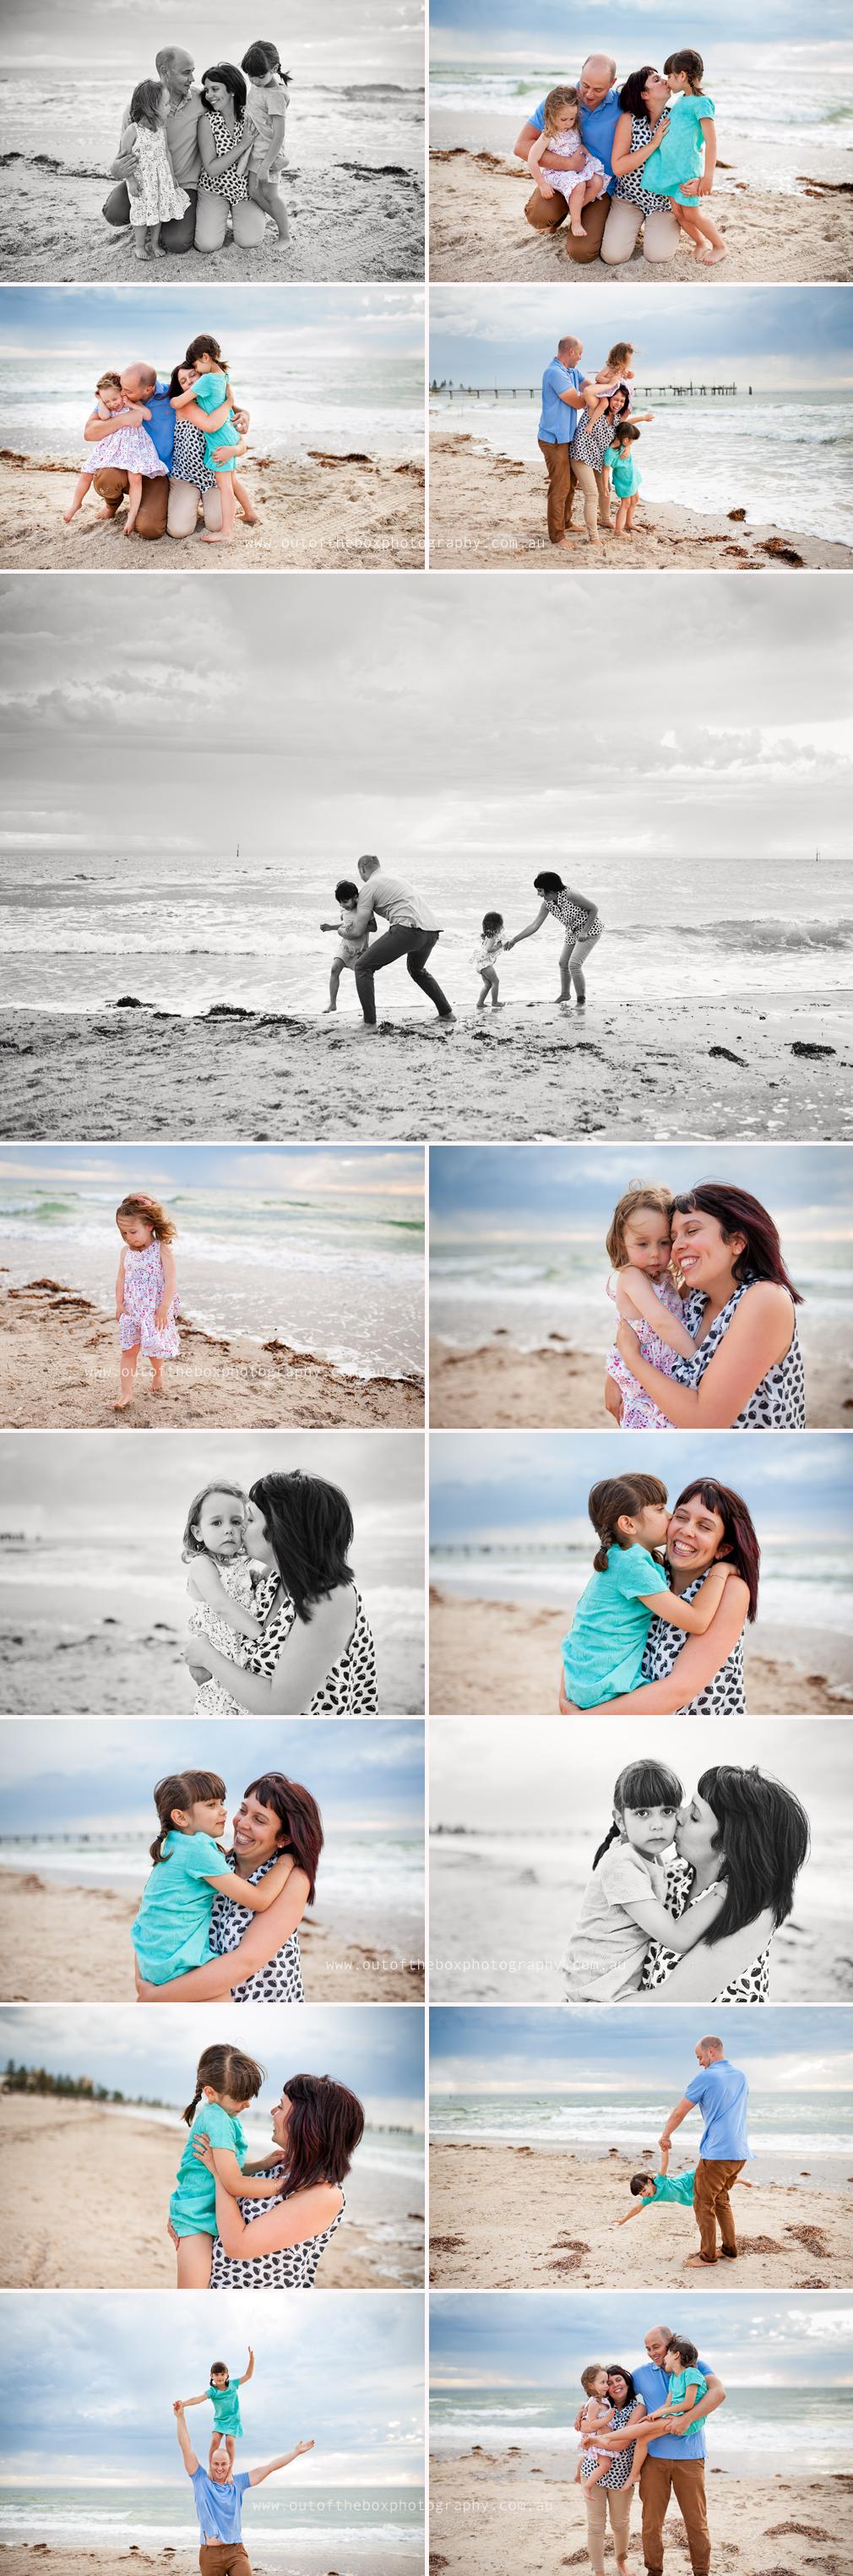 Adelaide-family-photography-Glenelg-Beach-4